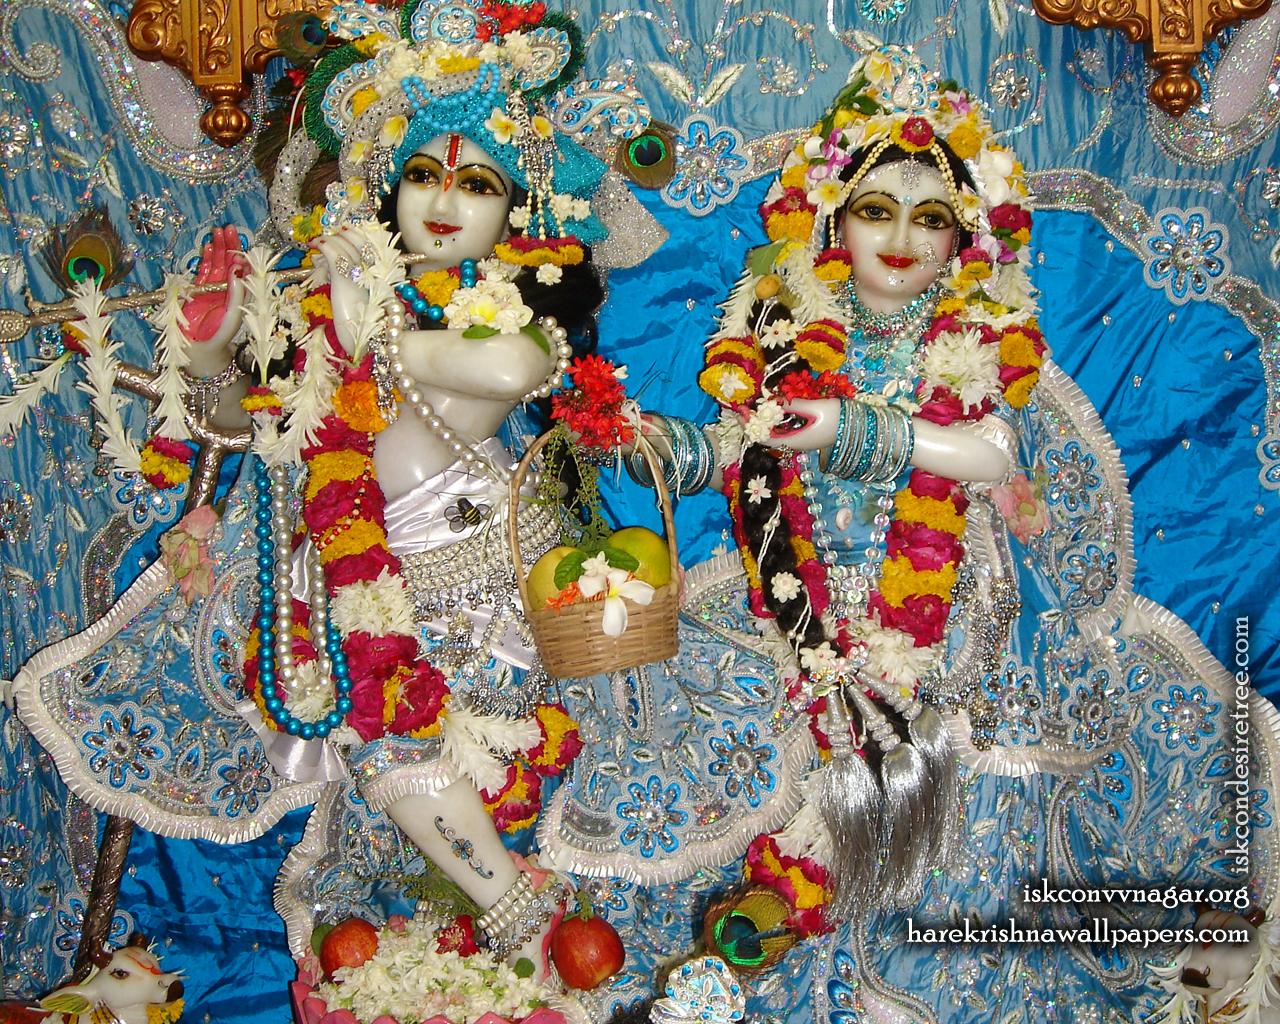 Sri Sri Radha Giridhari Wallpaper (022) Size 1280x1024 Download